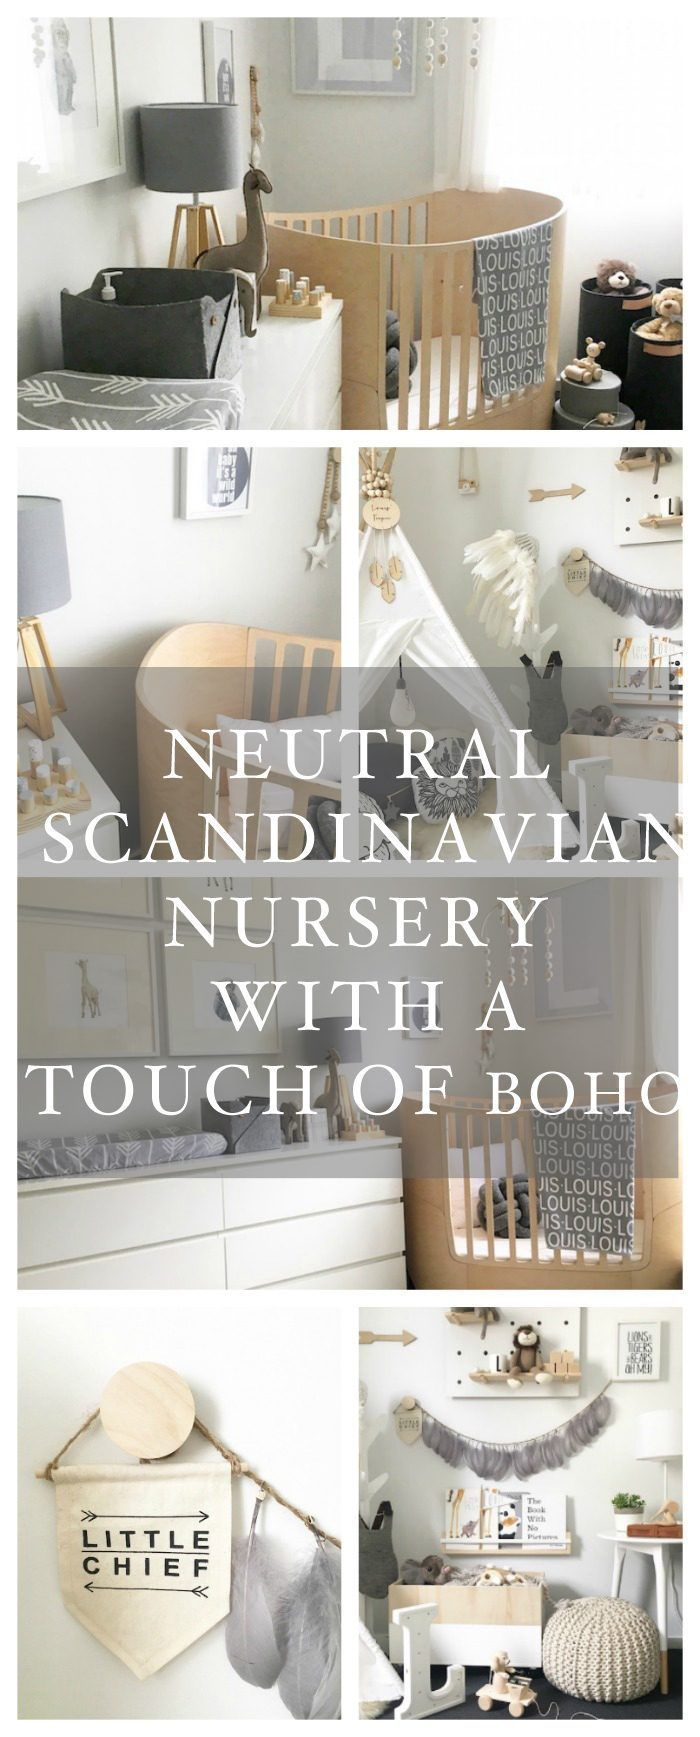 Neutral Scandinavian Nursery with a Touch of Boho ...